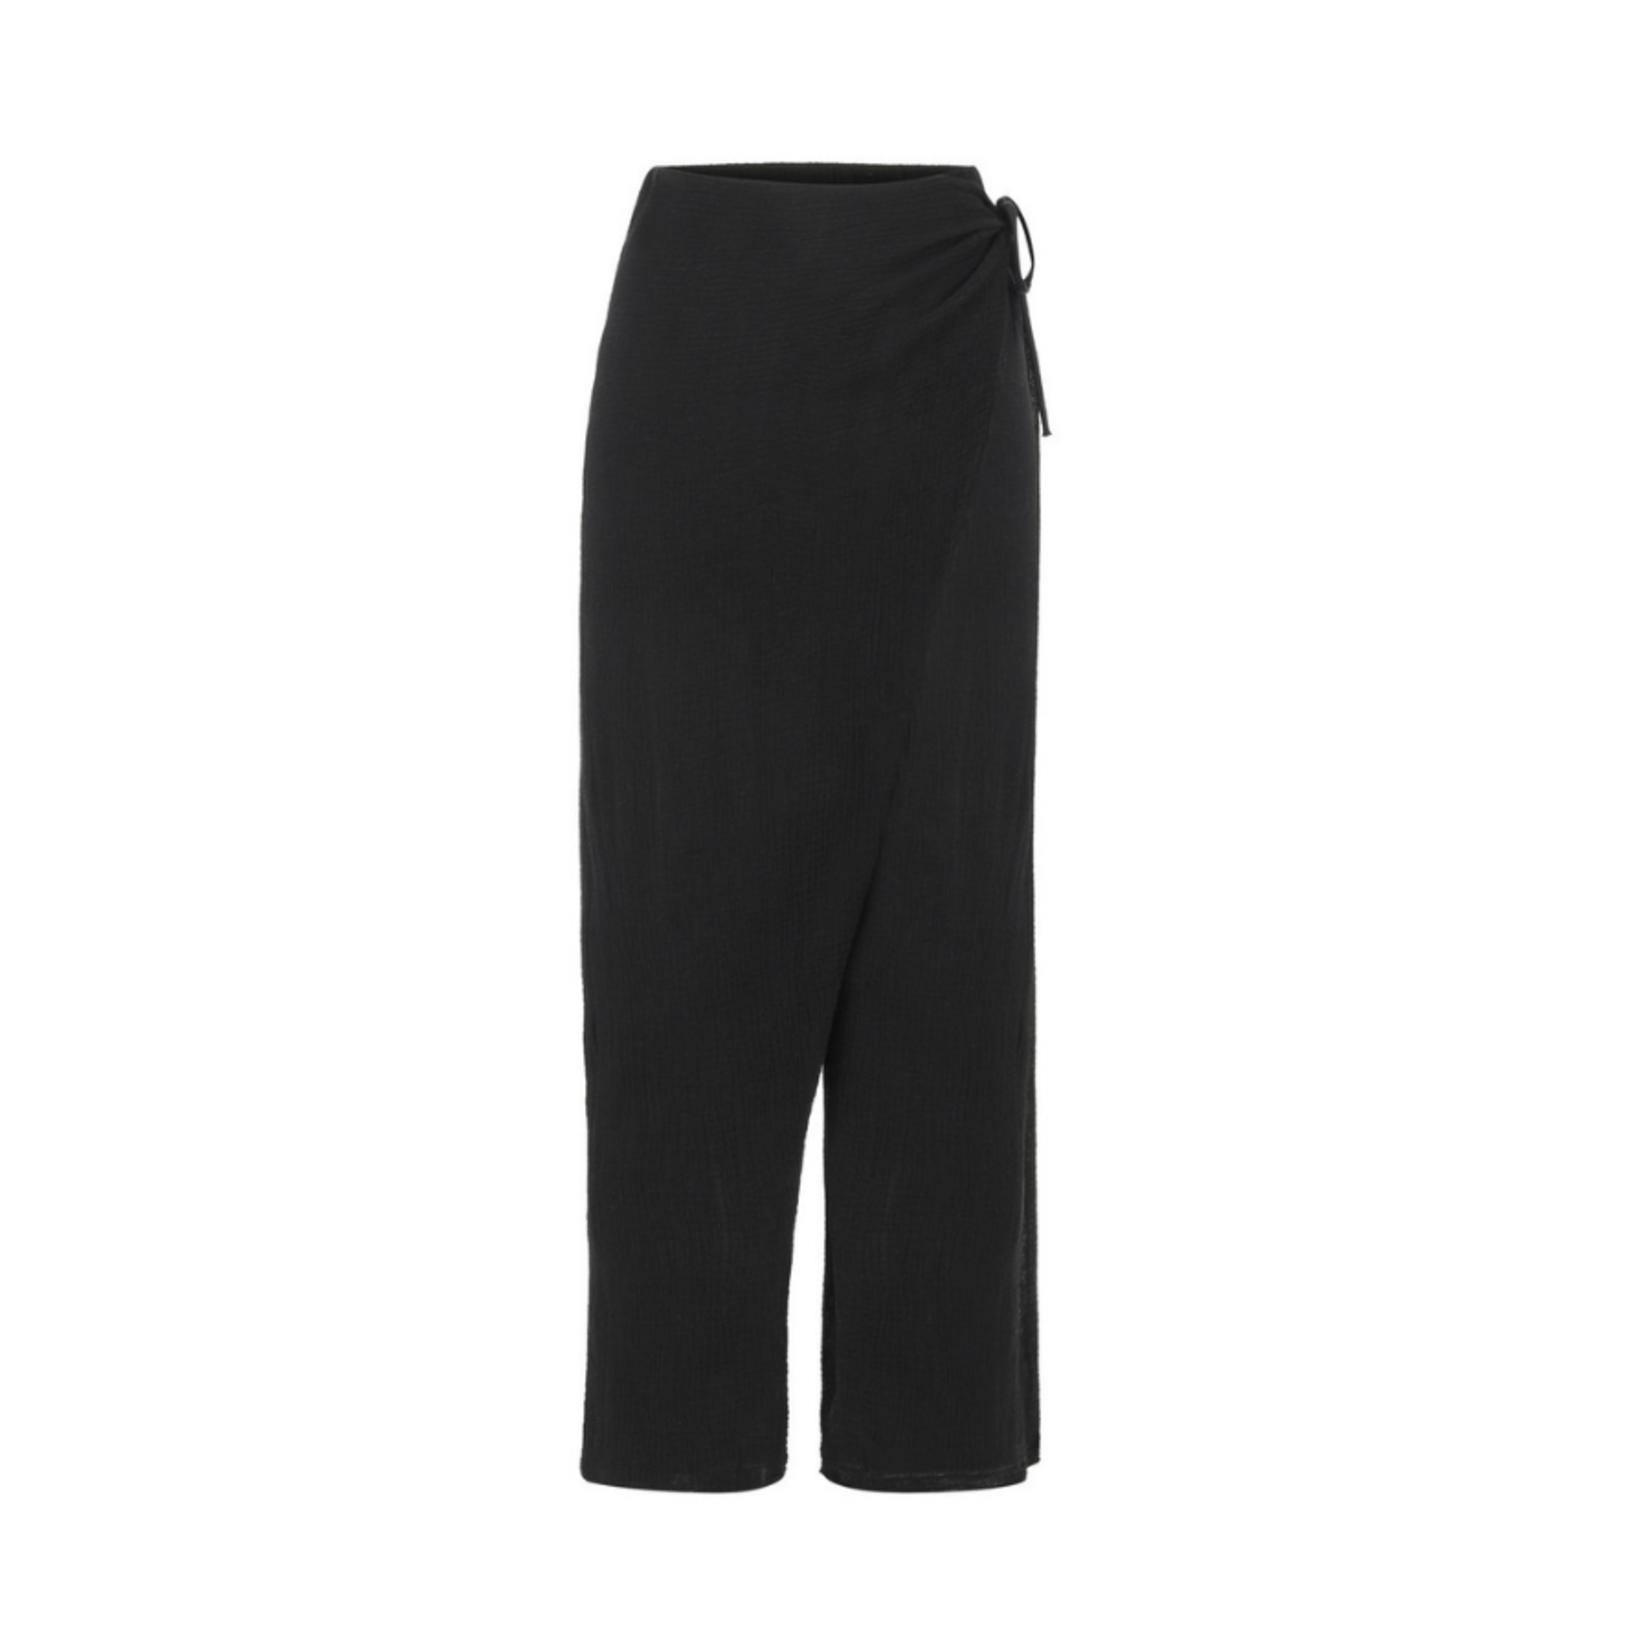 Handloom Nala Beach Pants